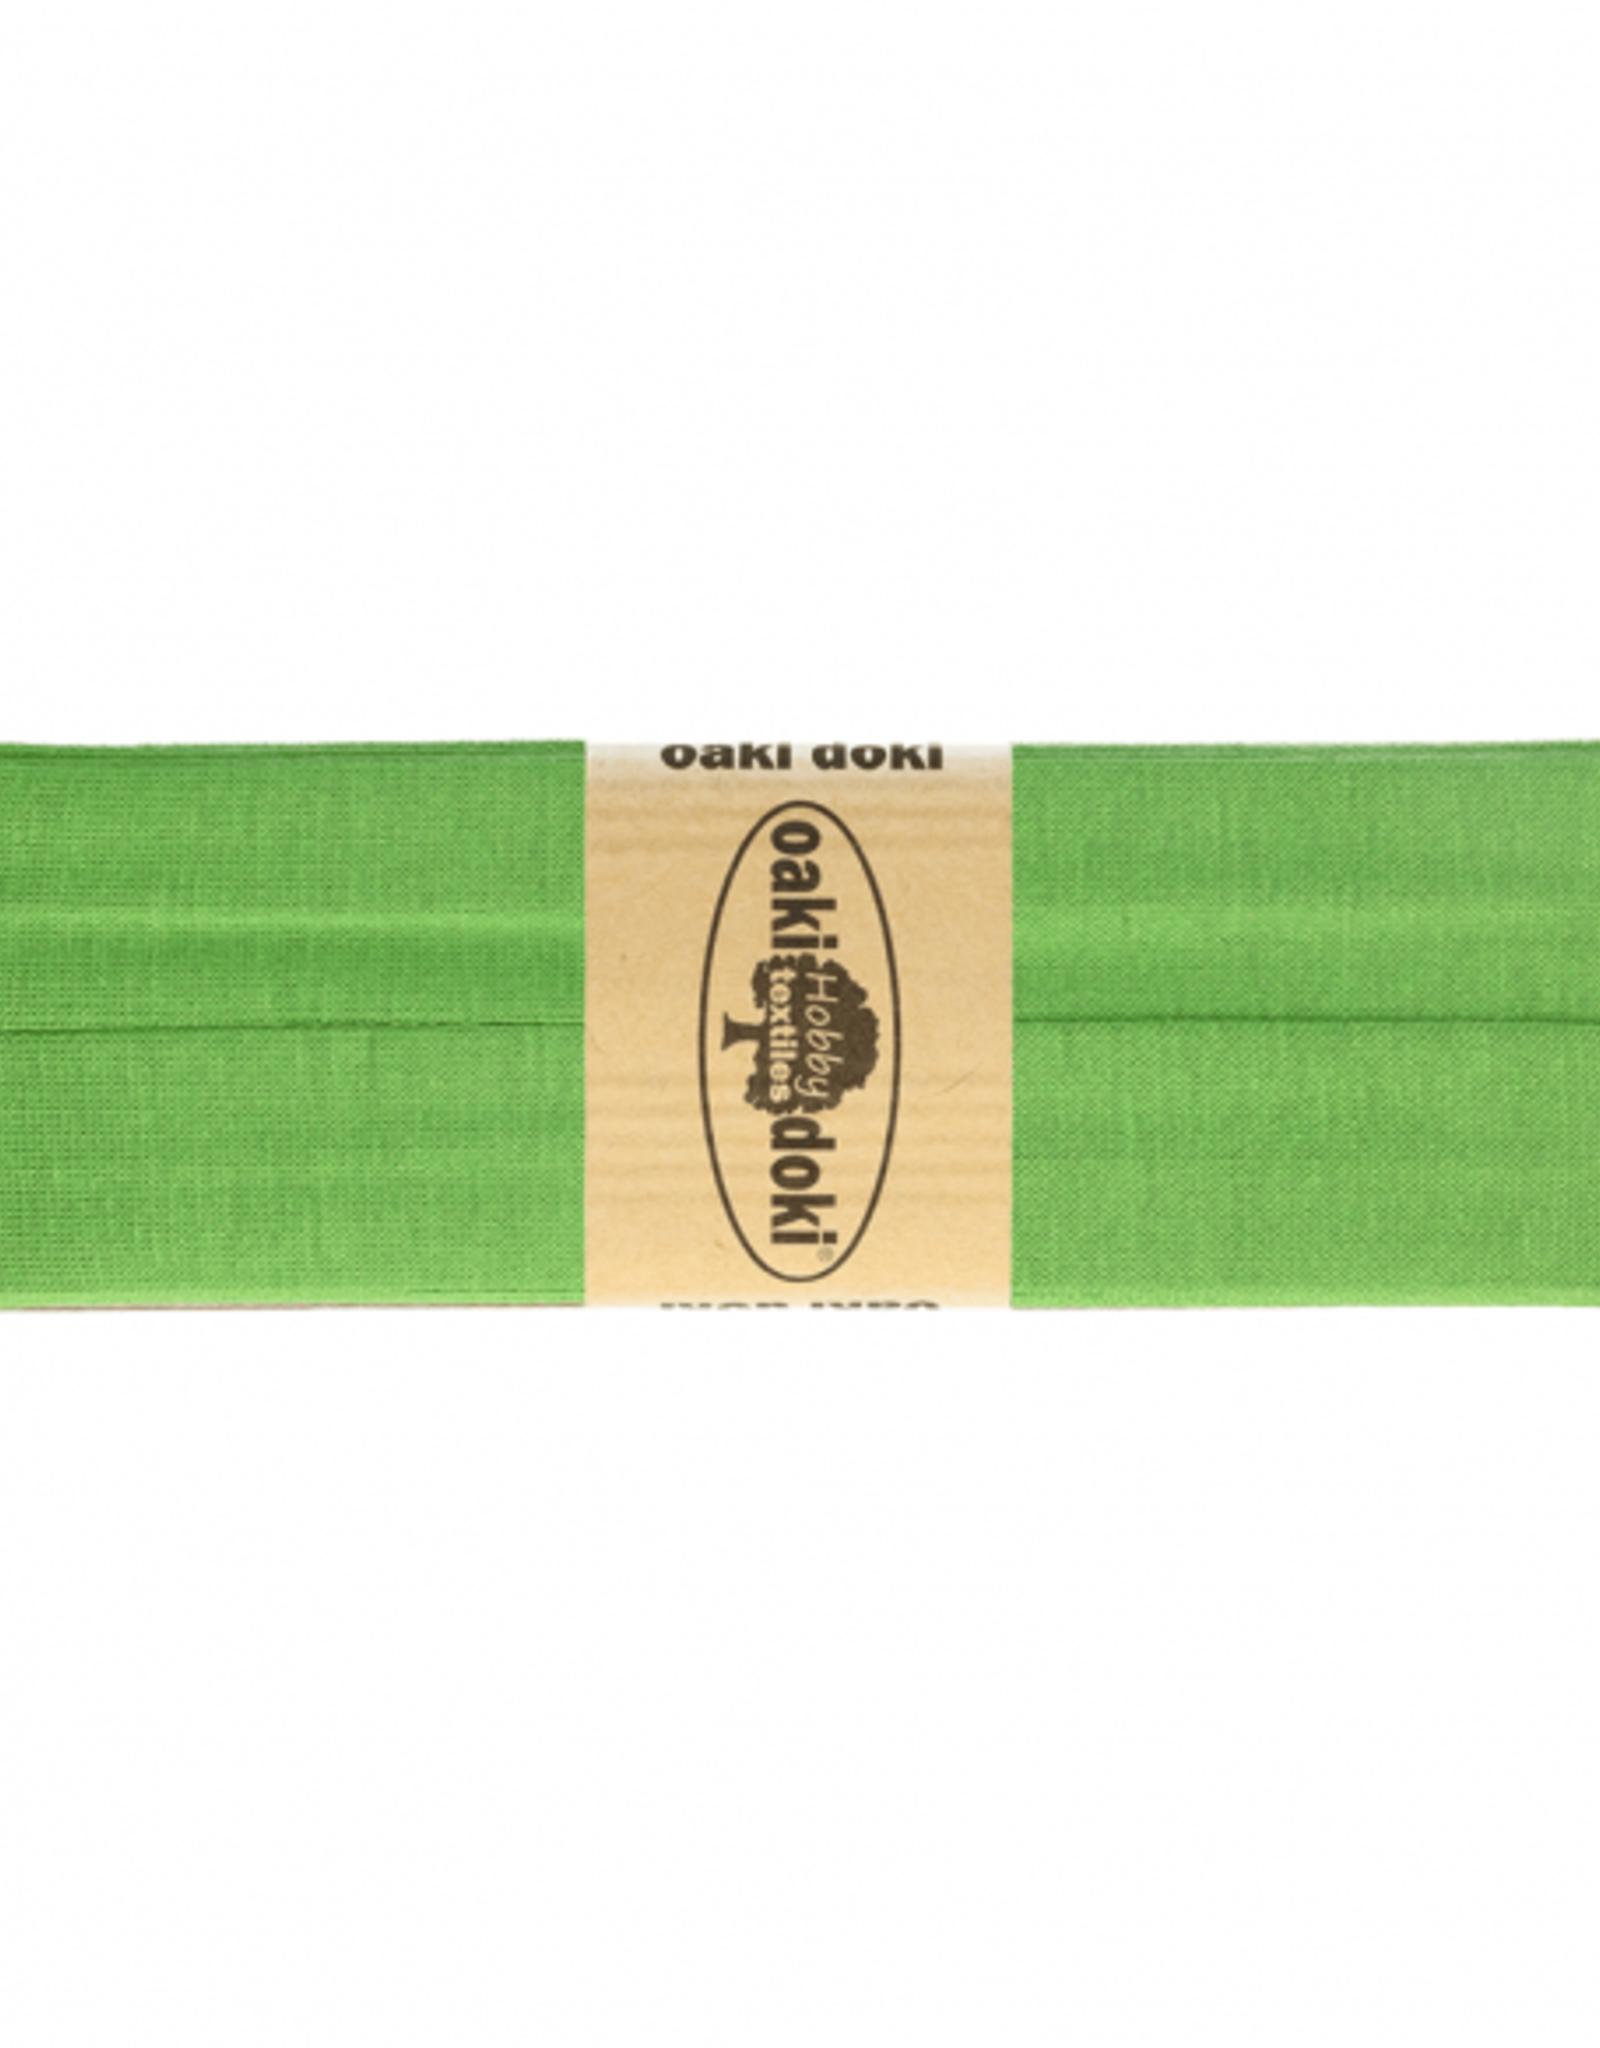 Oaki Doki Tricot de luxe jersey biaisband 20mm x 3m 447